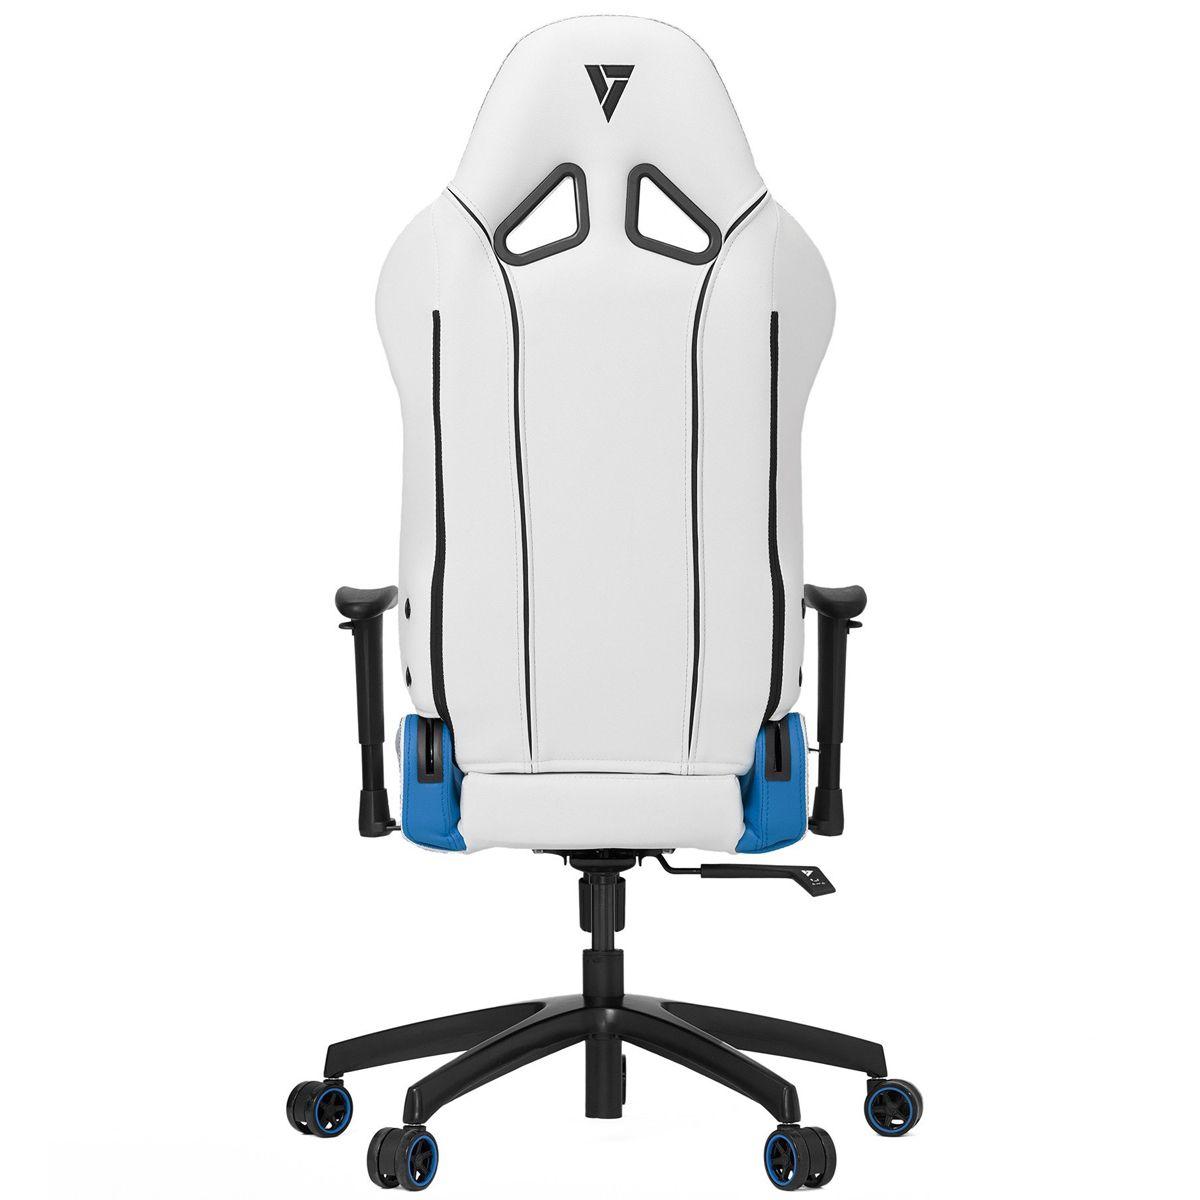 Cadeira Gamer Vertagear Racing S-LINE SL2000 Branca e AZUL